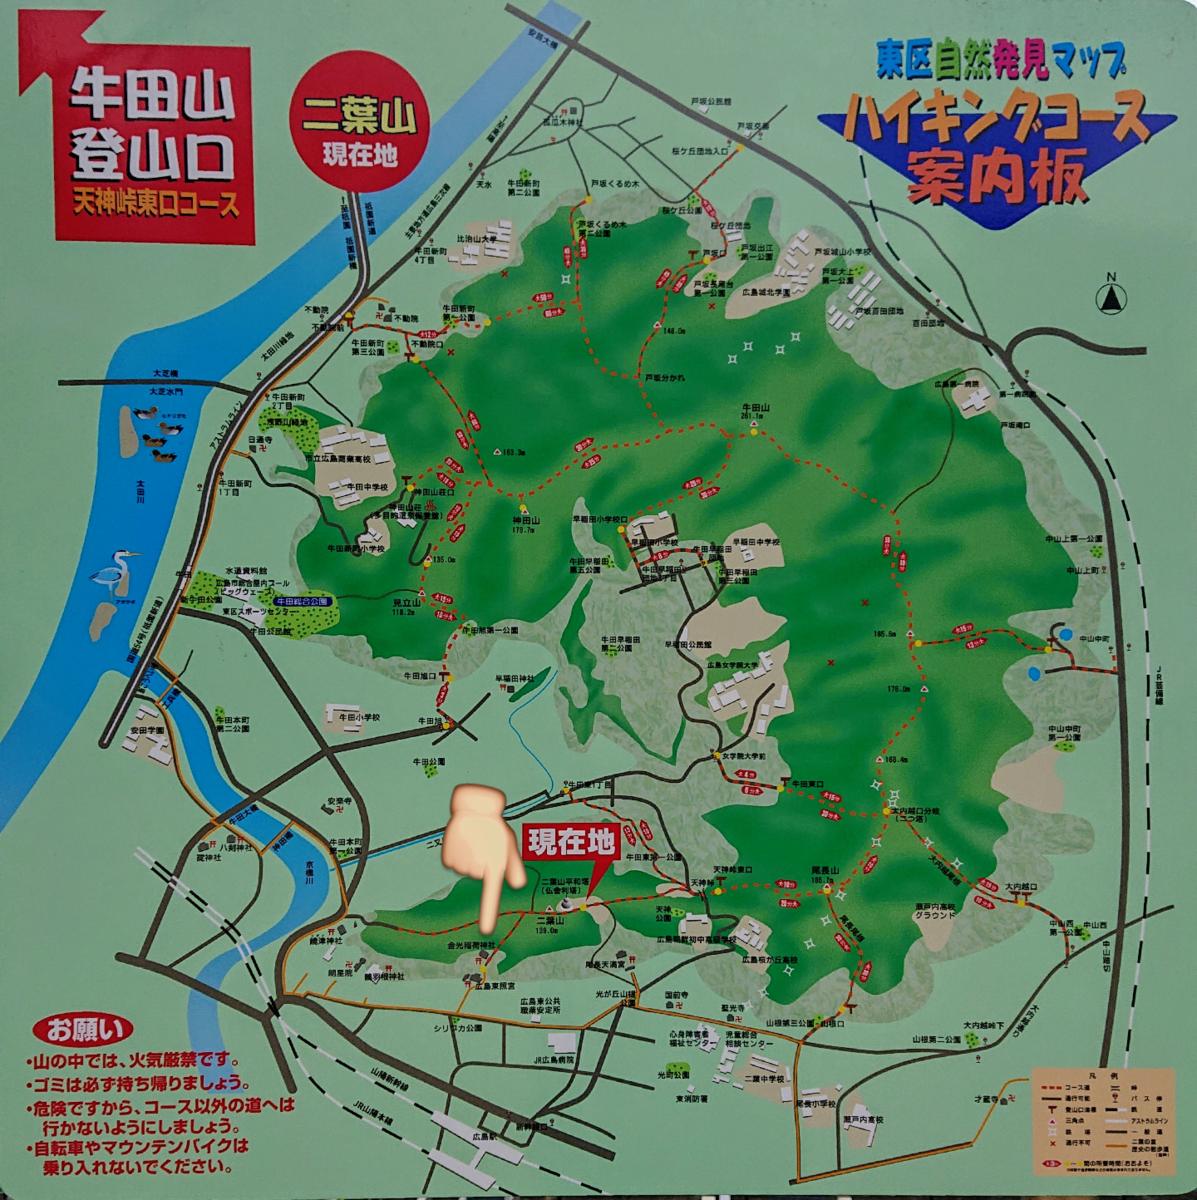 f:id:Kaimotu_Hatuji:20200104203432p:plain